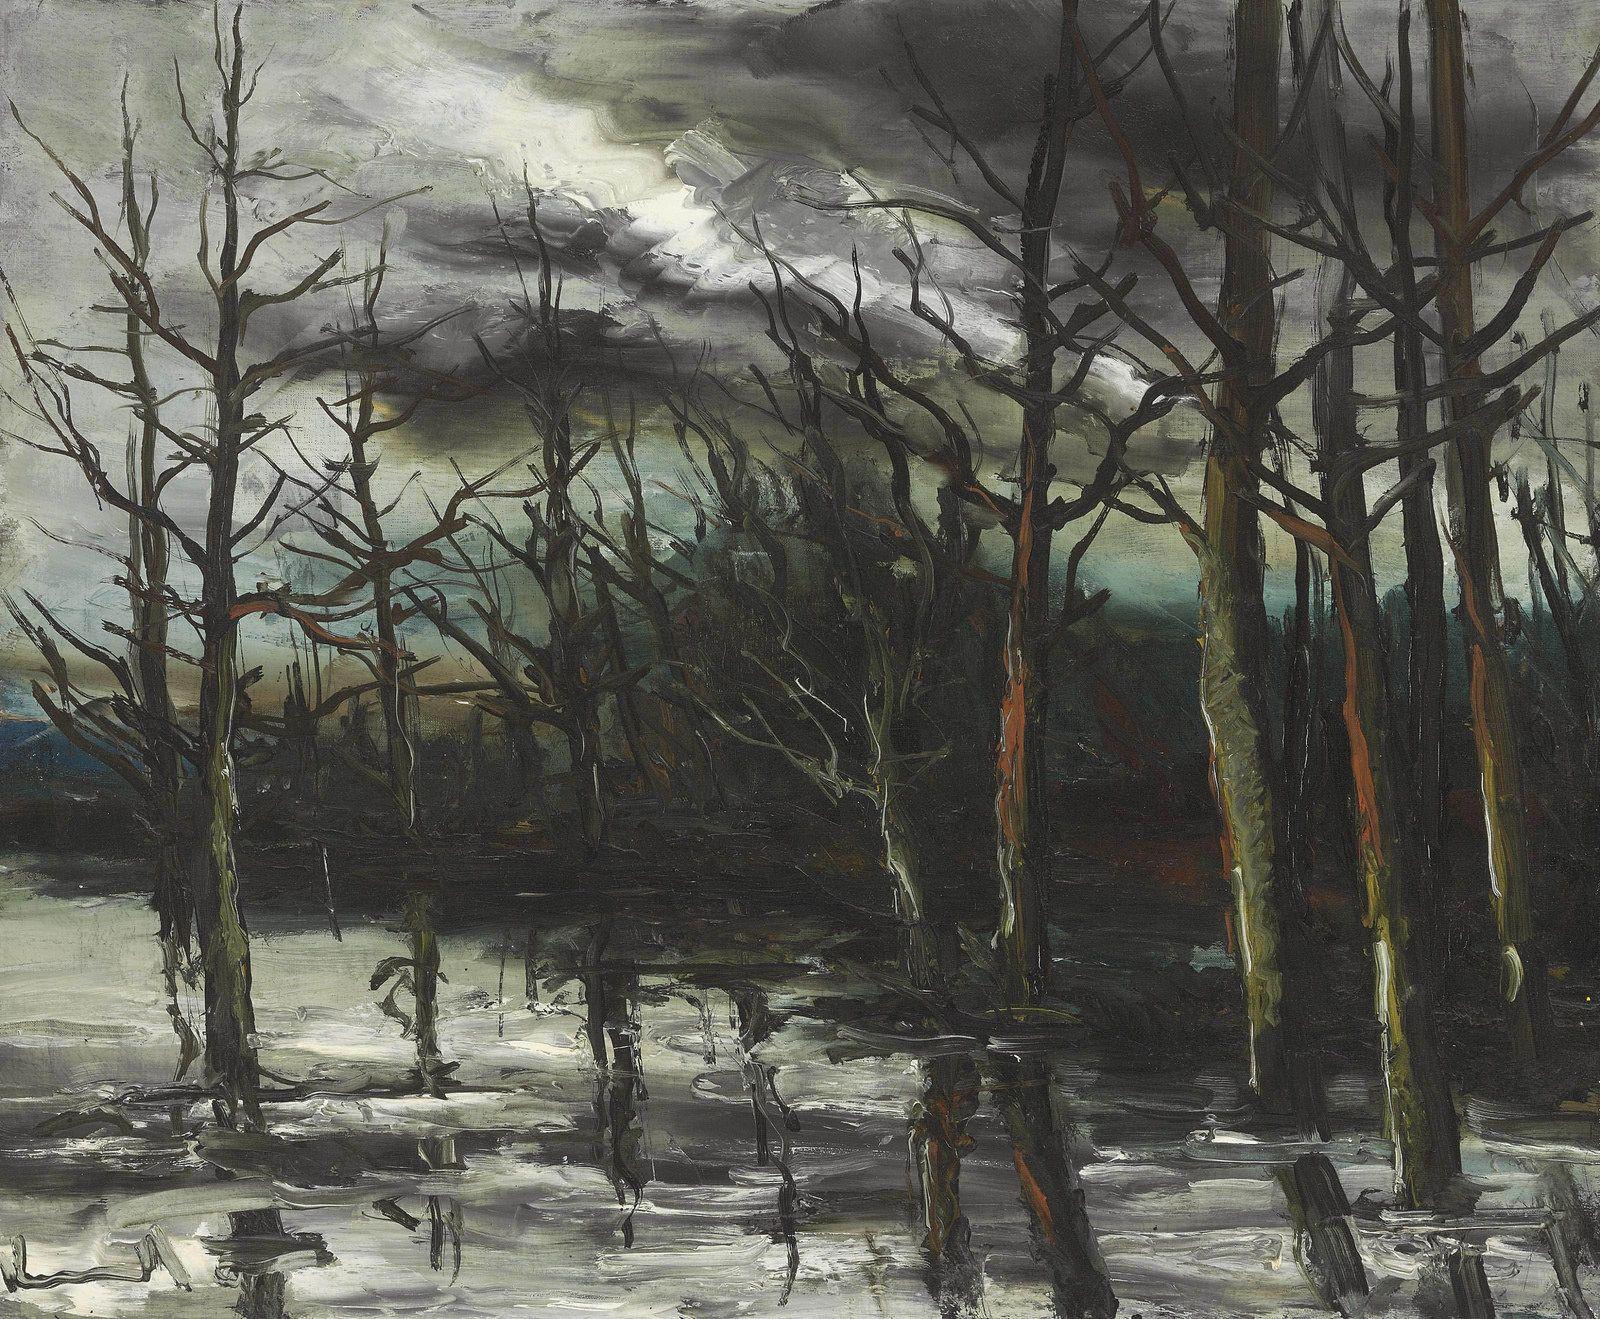 Flood in the Forest. Maurice de Vlaminck